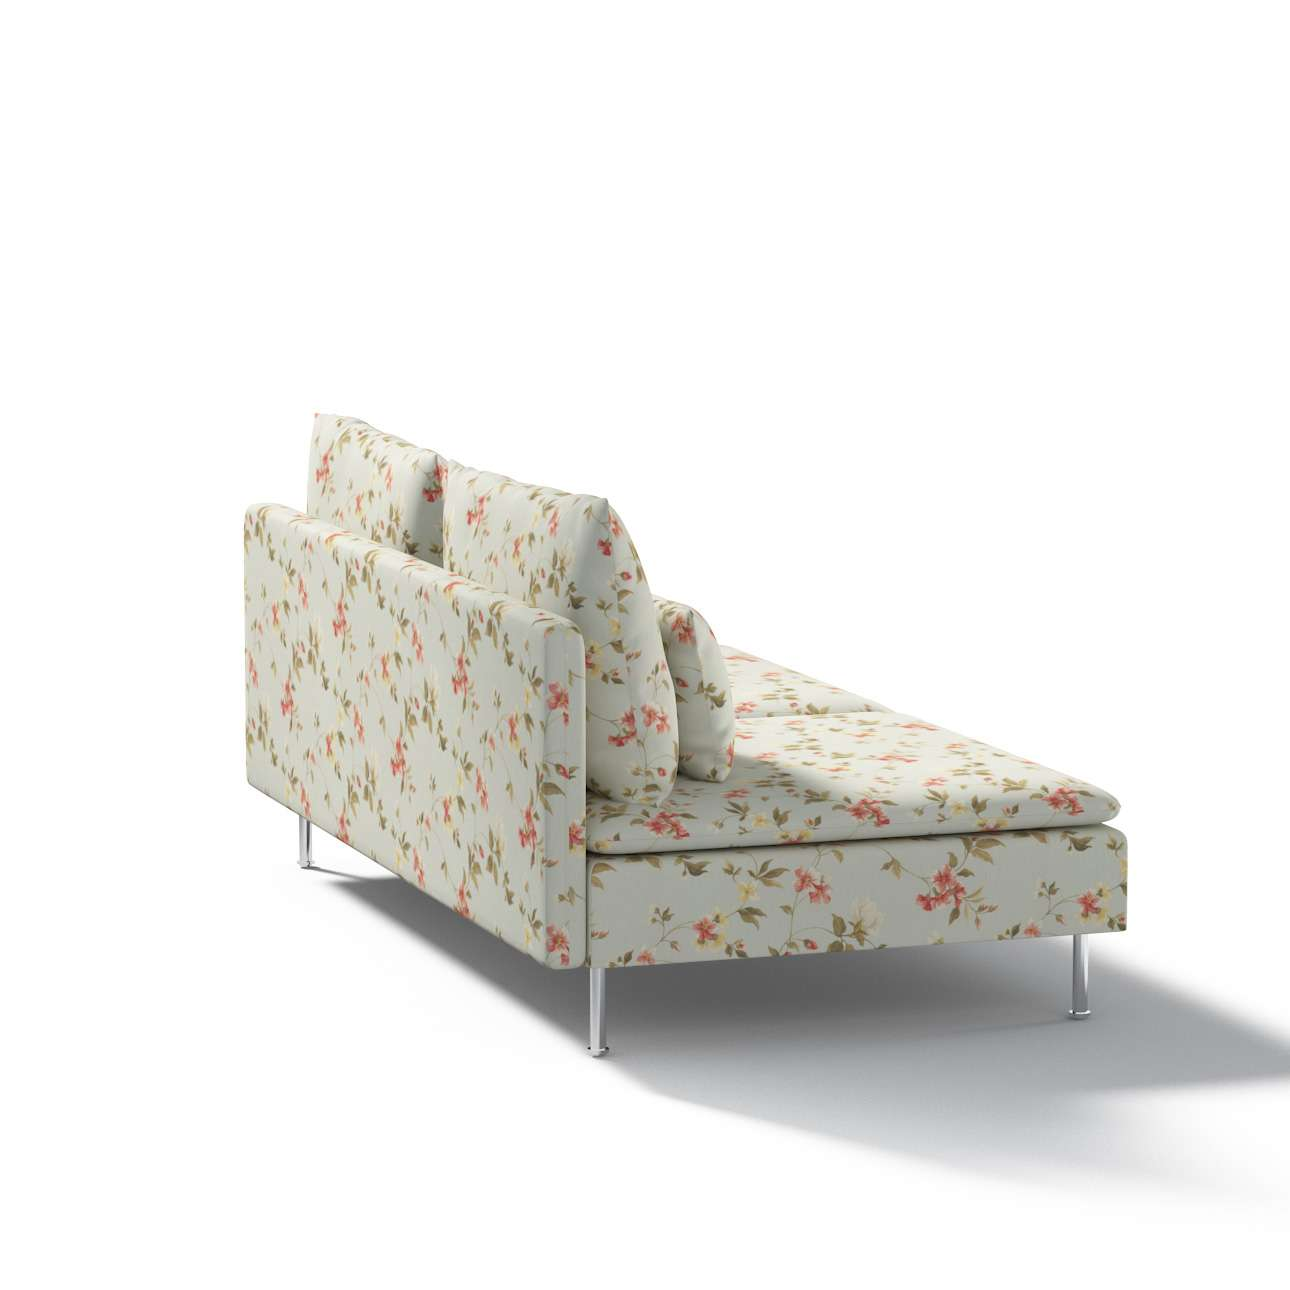 s derhamn bezug f r sitzelement 3 hellblau dekoria. Black Bedroom Furniture Sets. Home Design Ideas